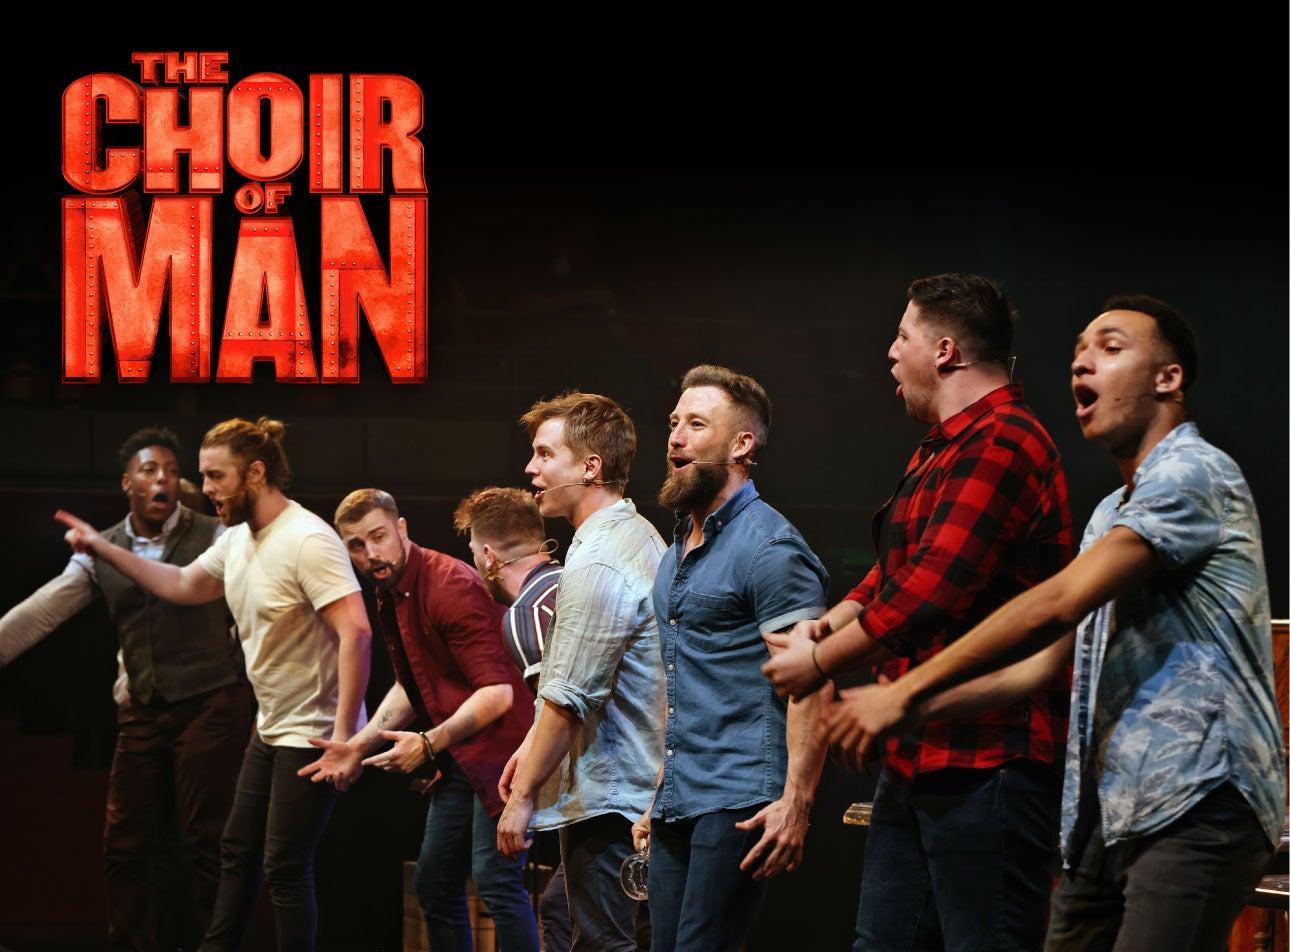 Choir of Man Thumbnail Image